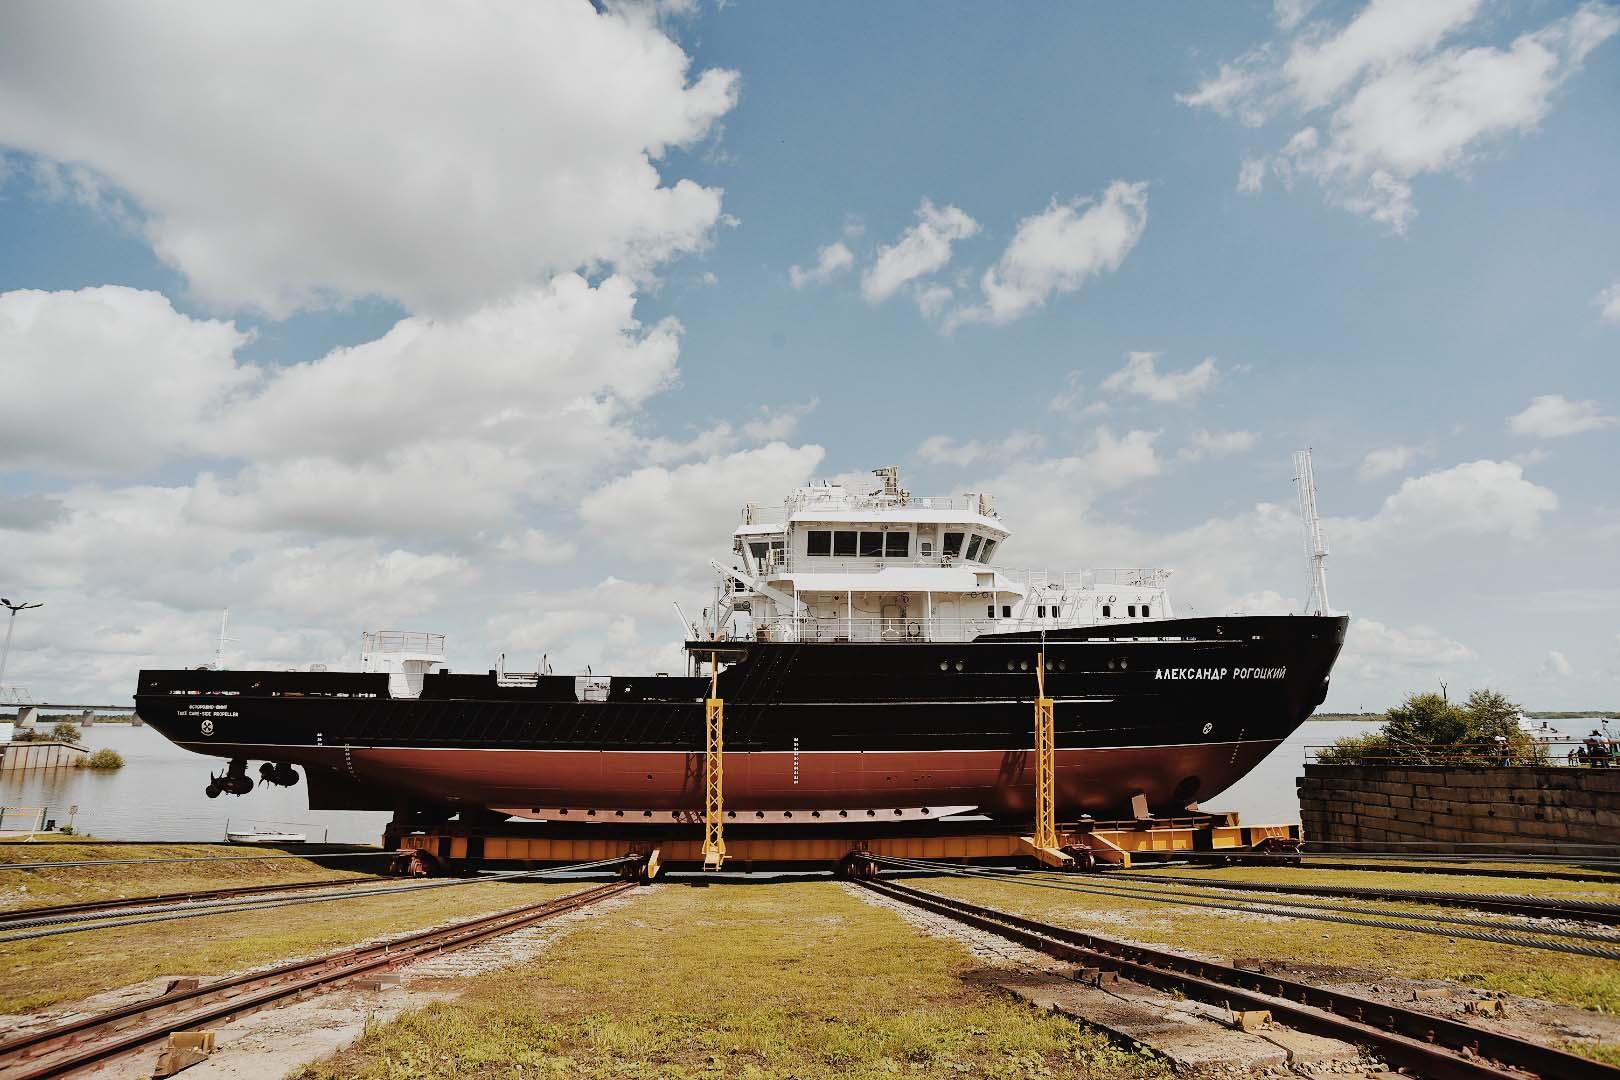 Спущено на воду малое гидрографическое судно «Александр Рогоцкий»